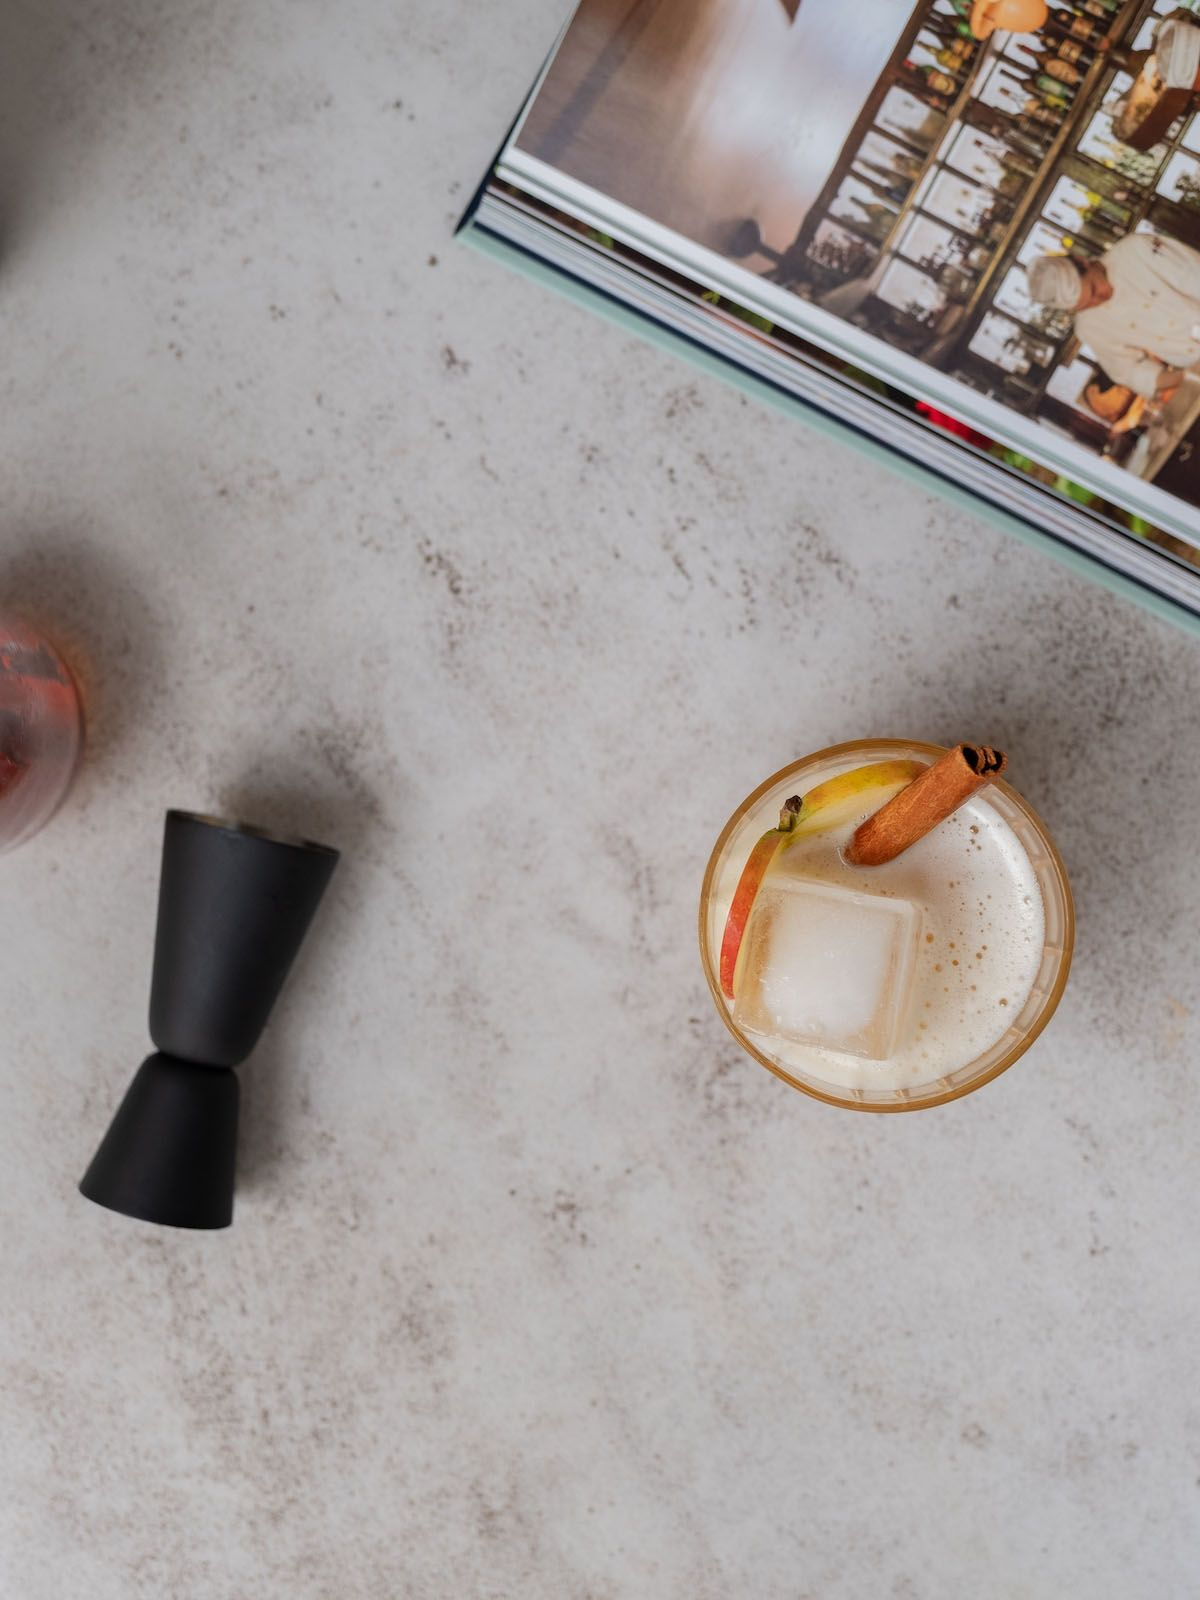 Rezept About Fuel Foodblog Ketel One Bratapfel Sour, Jigger, Zimt, Apfelsaft